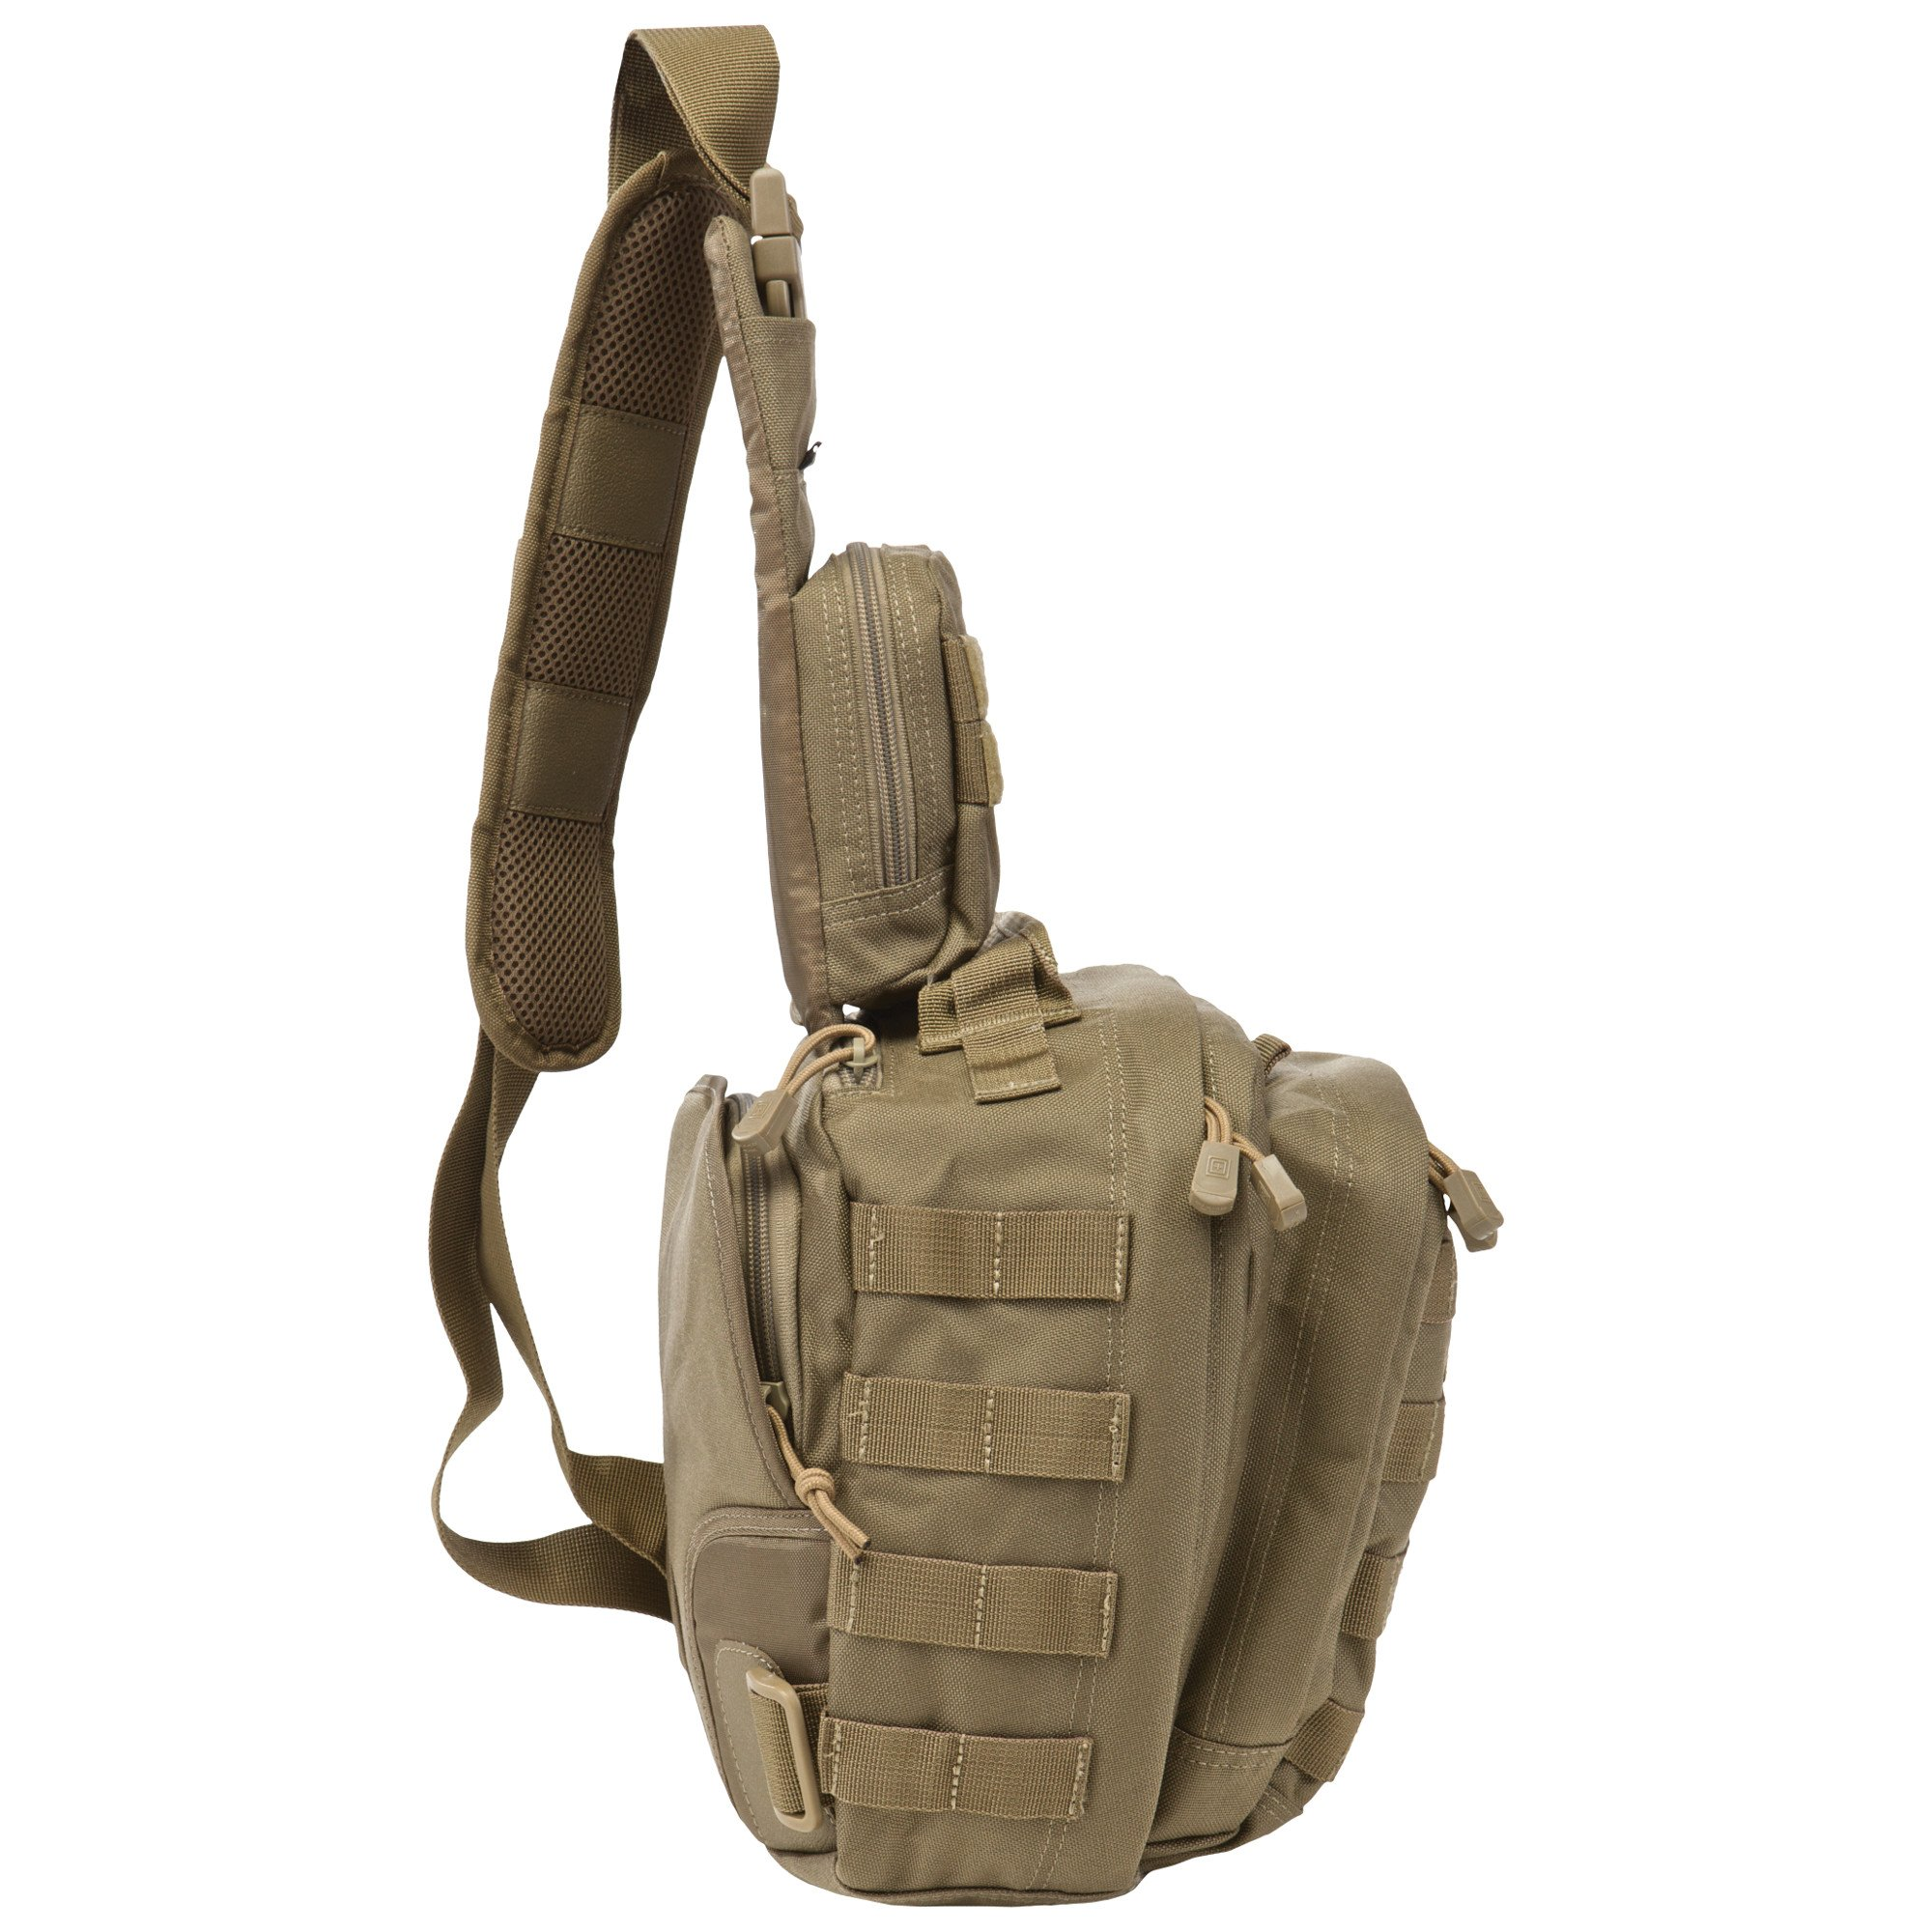 Balo 5.11 Tactical Rush Moab 6 – Tac OD